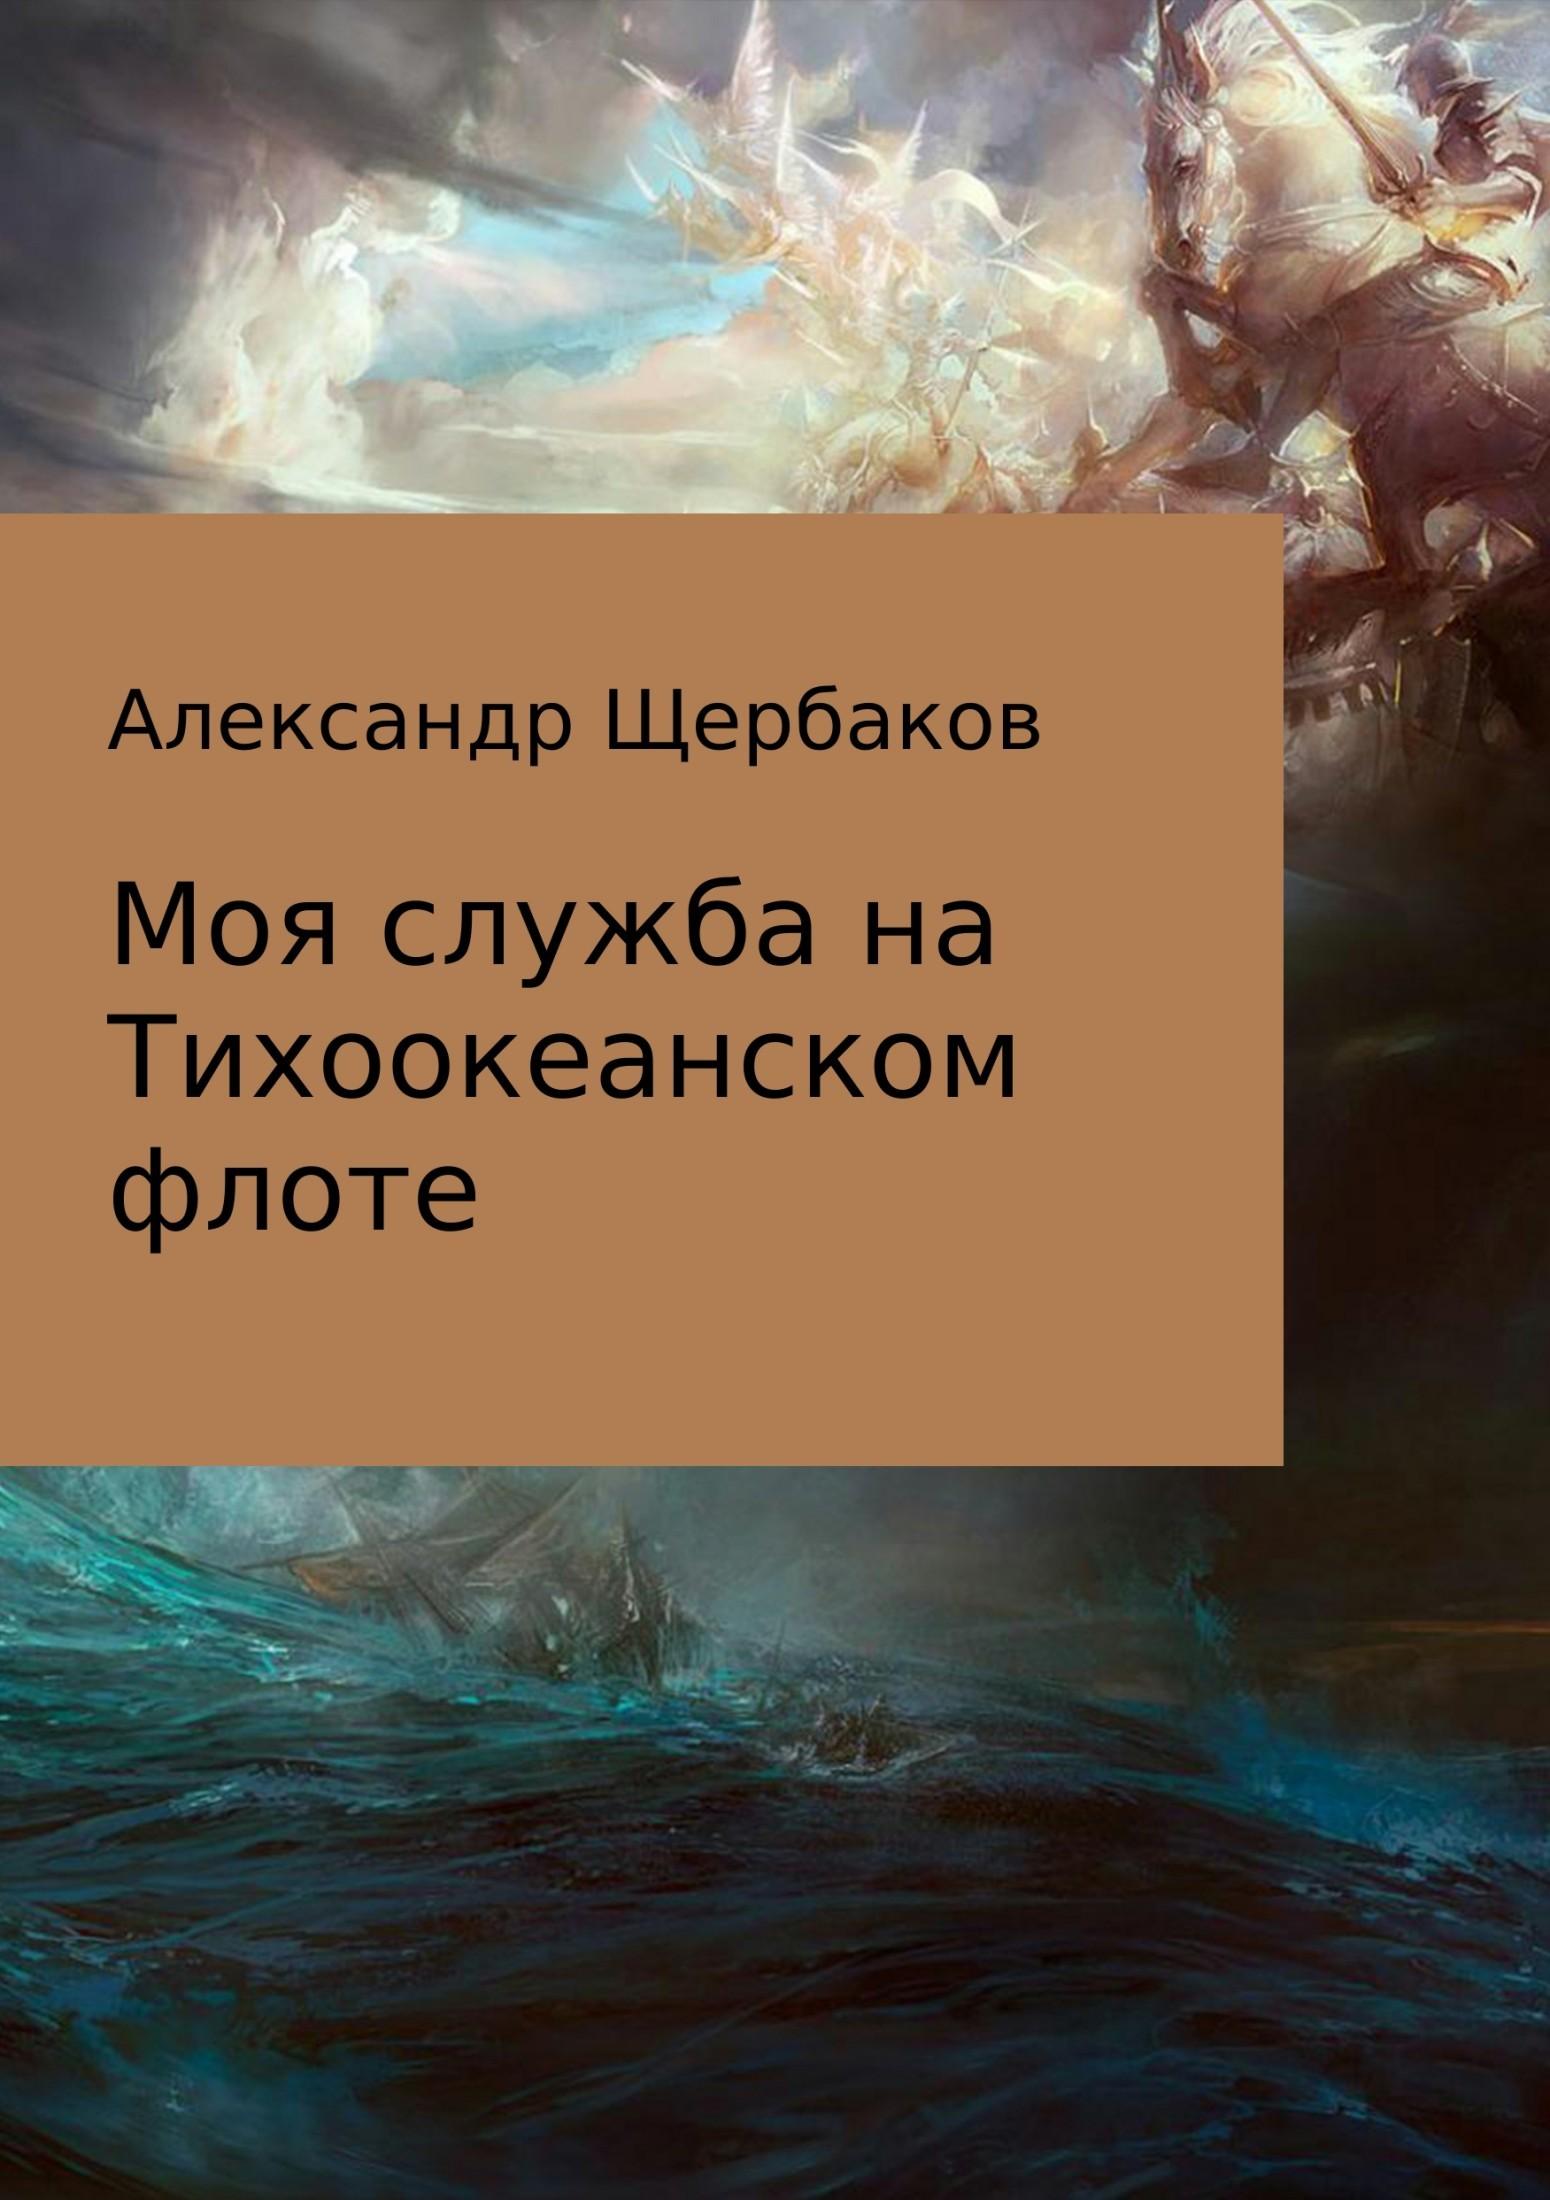 Александр Щербаков Моя служба на Тихоокеанском флоте